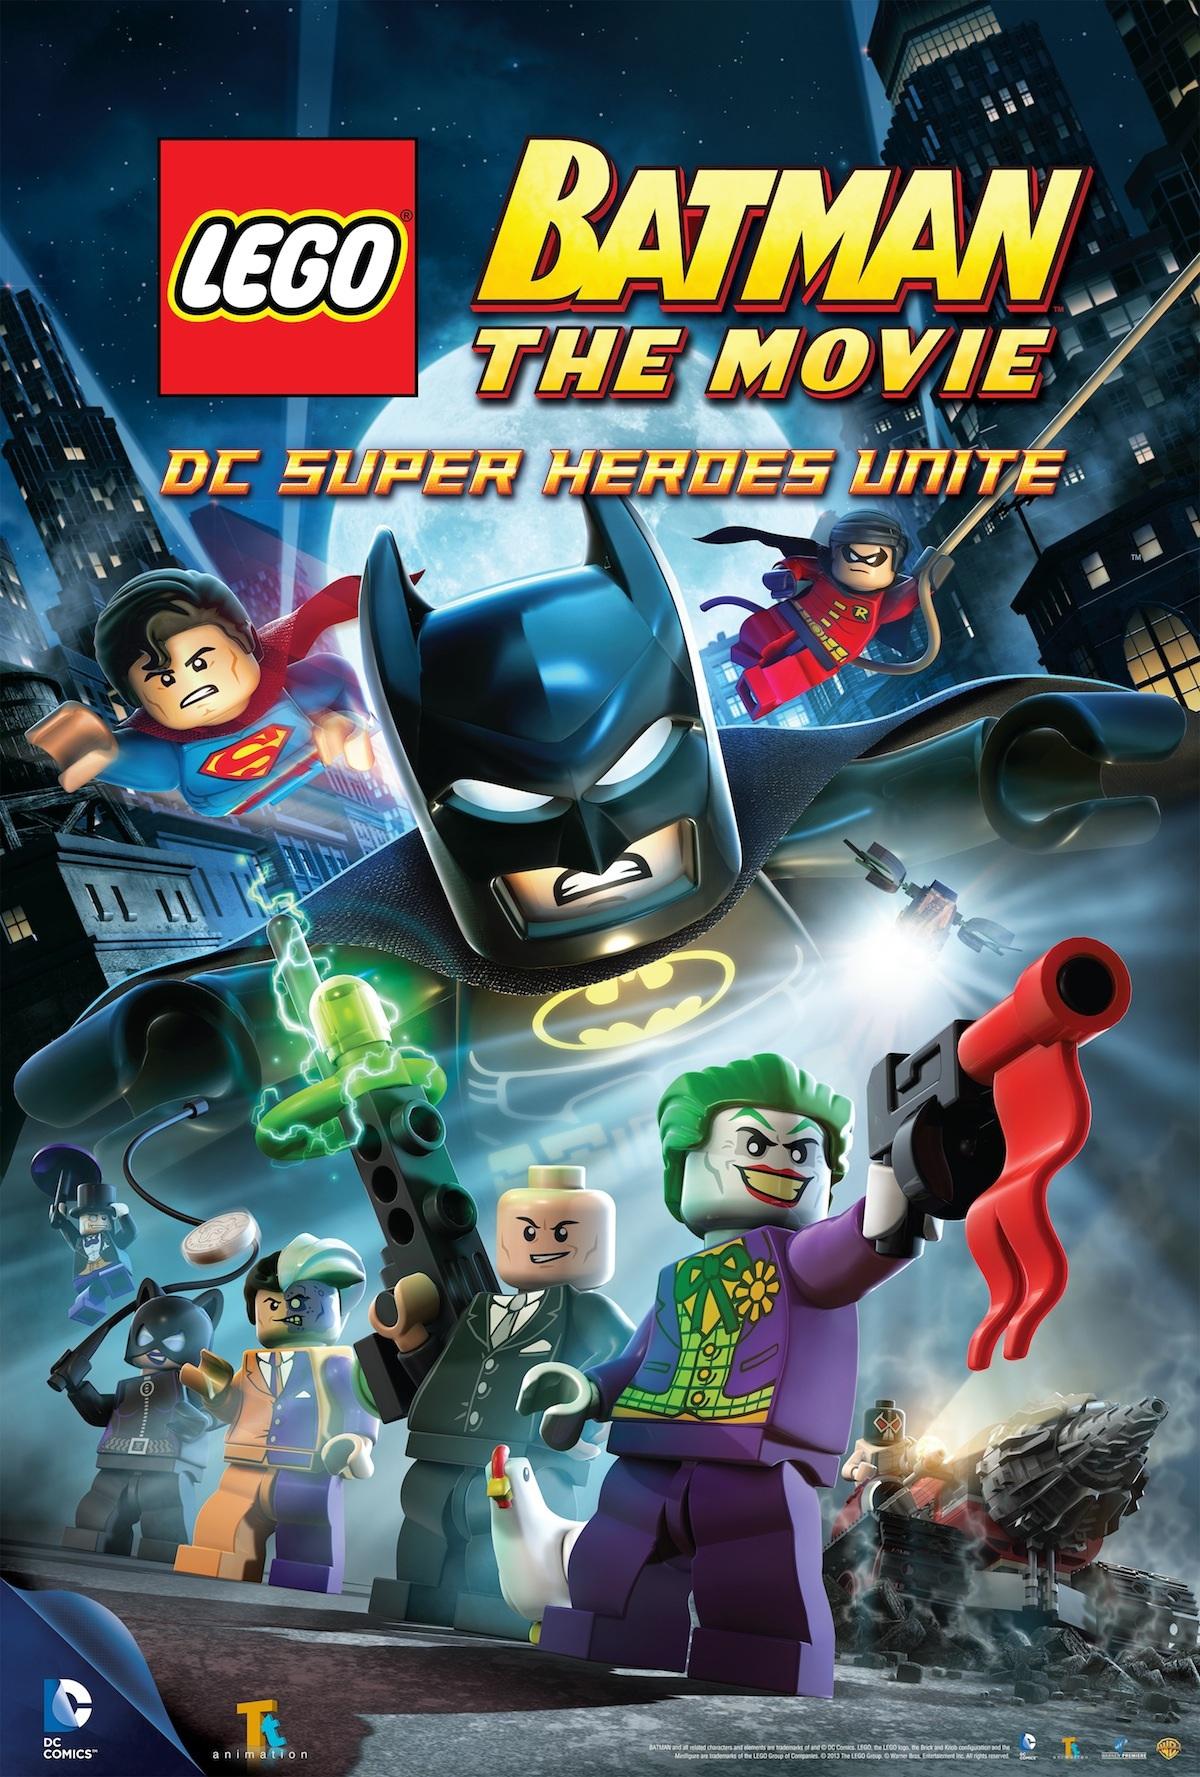 LEGO Batman: The Movie - DC Super Heroes Unite